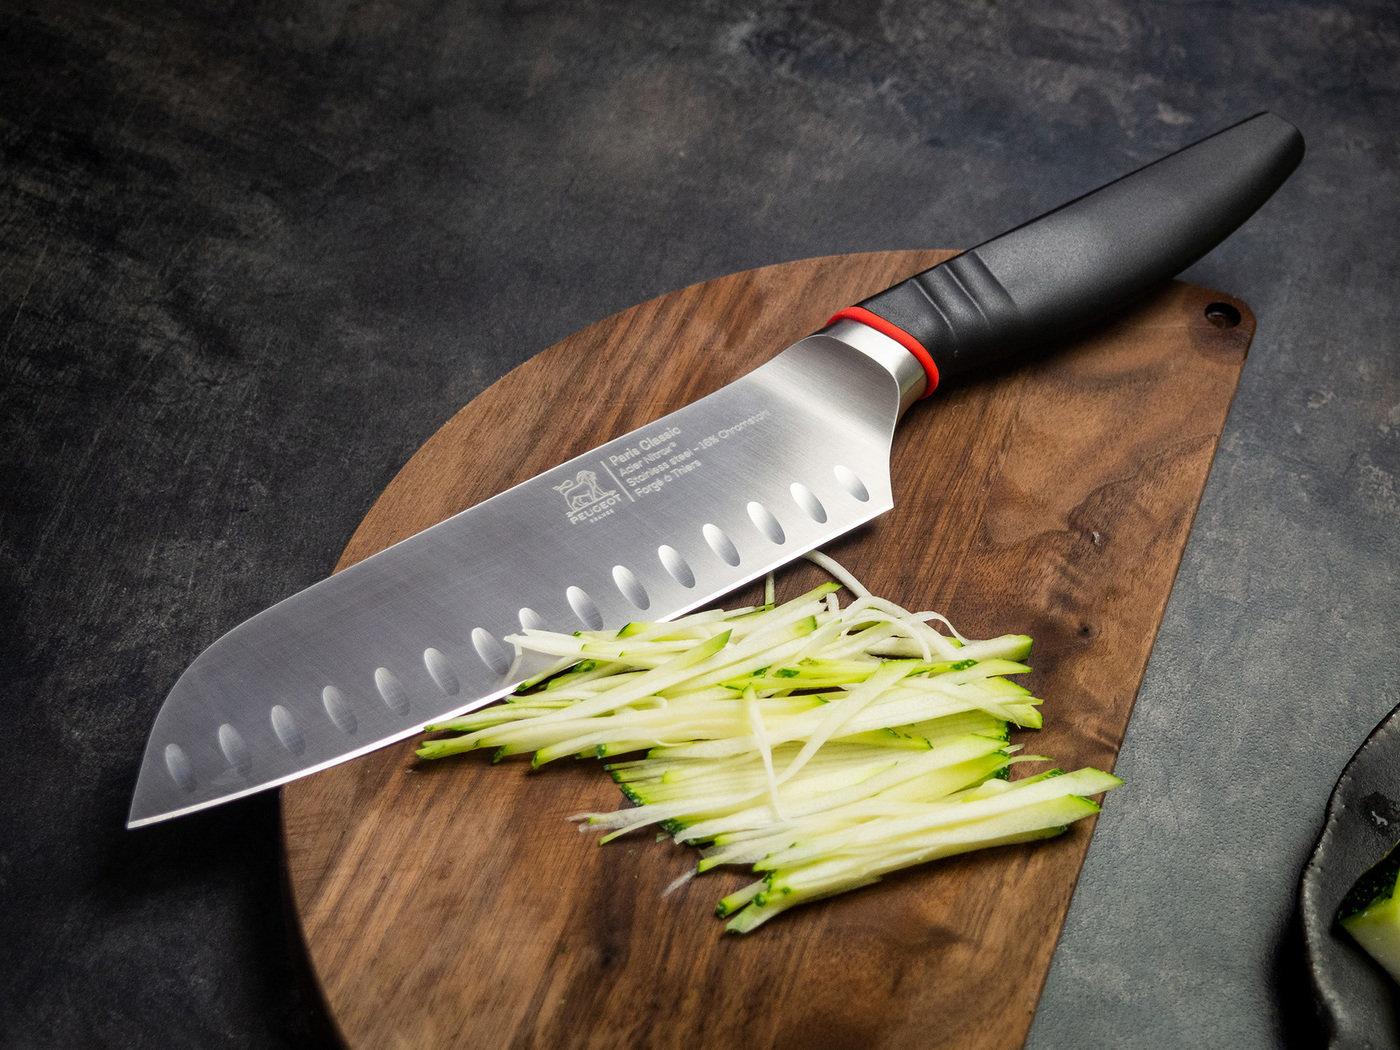 шеф нож сантоку